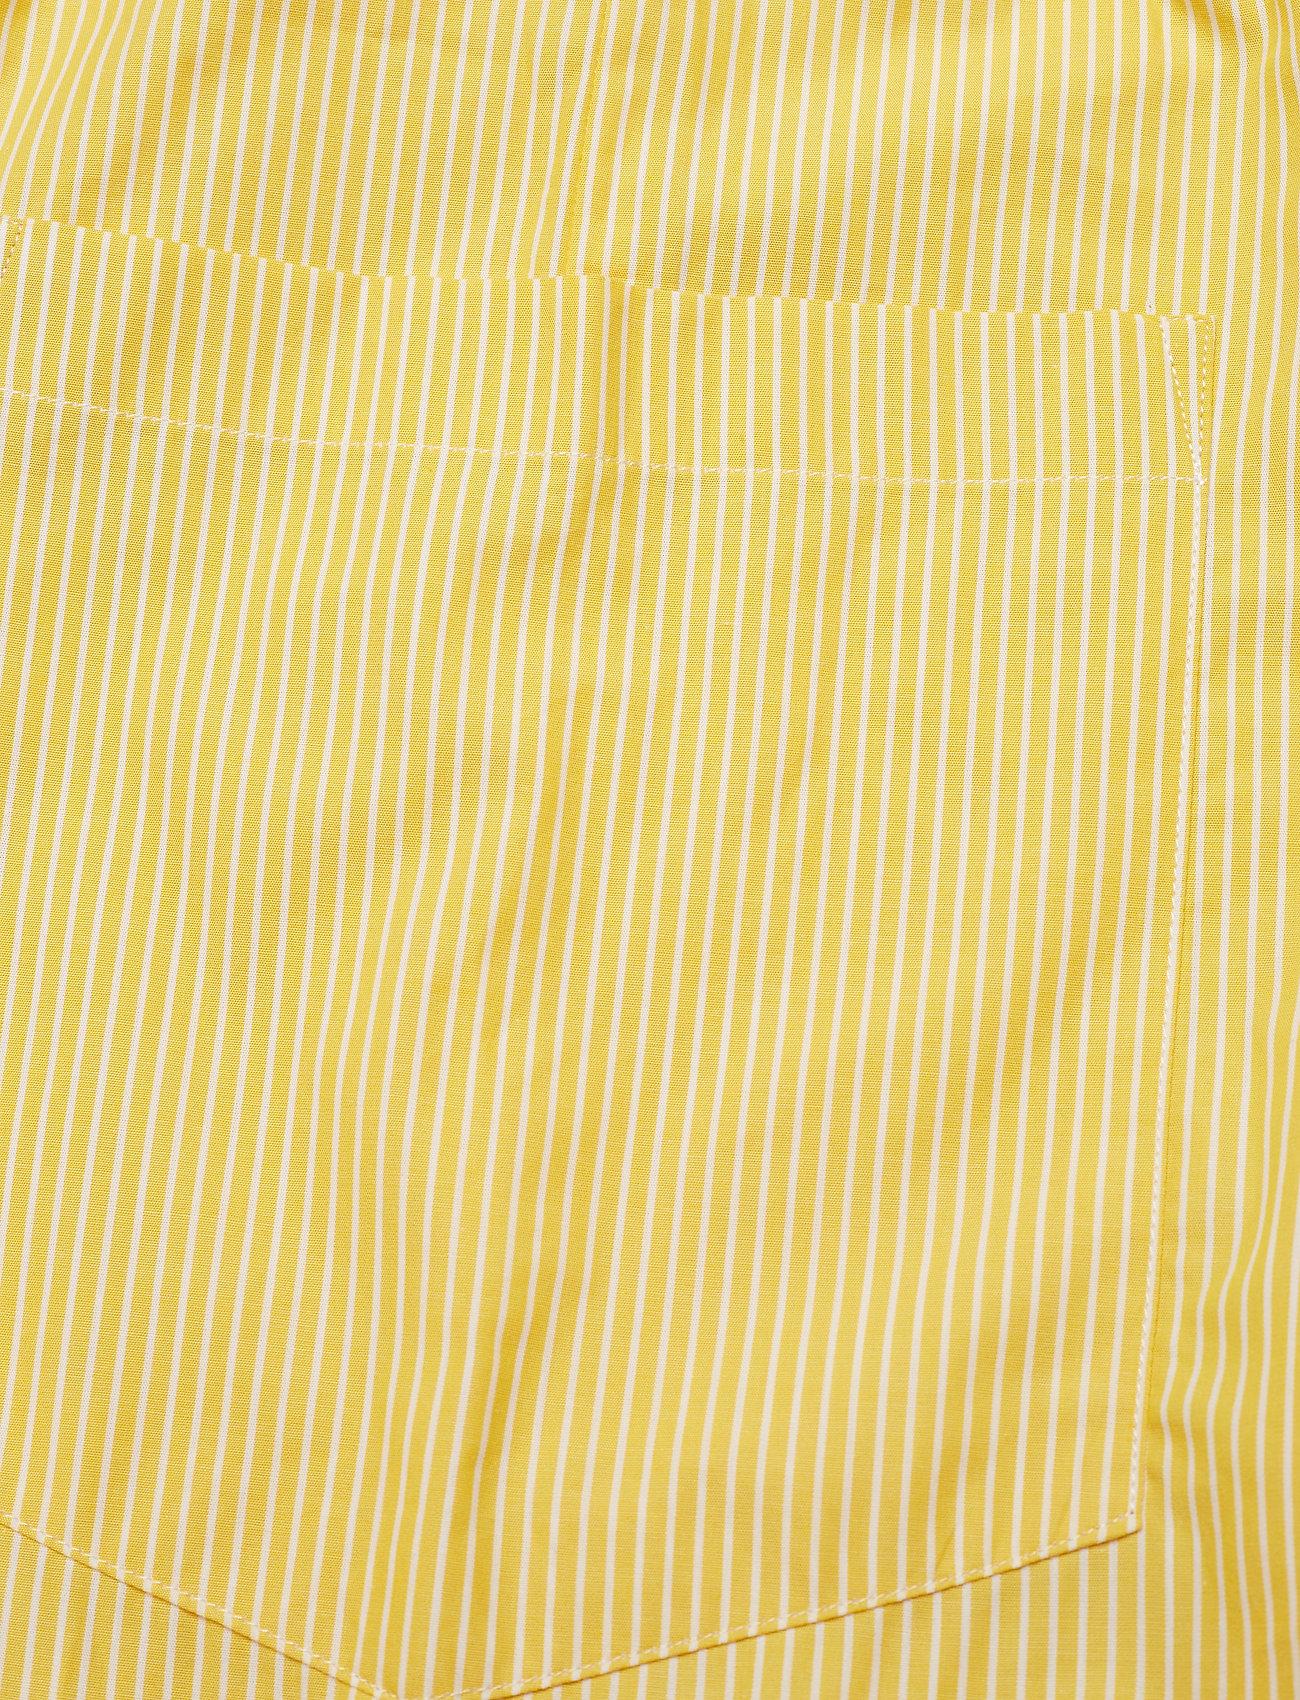 Libertine-Libertine Unit- Robes o2ucRESY CZGnY DmlDKHPA